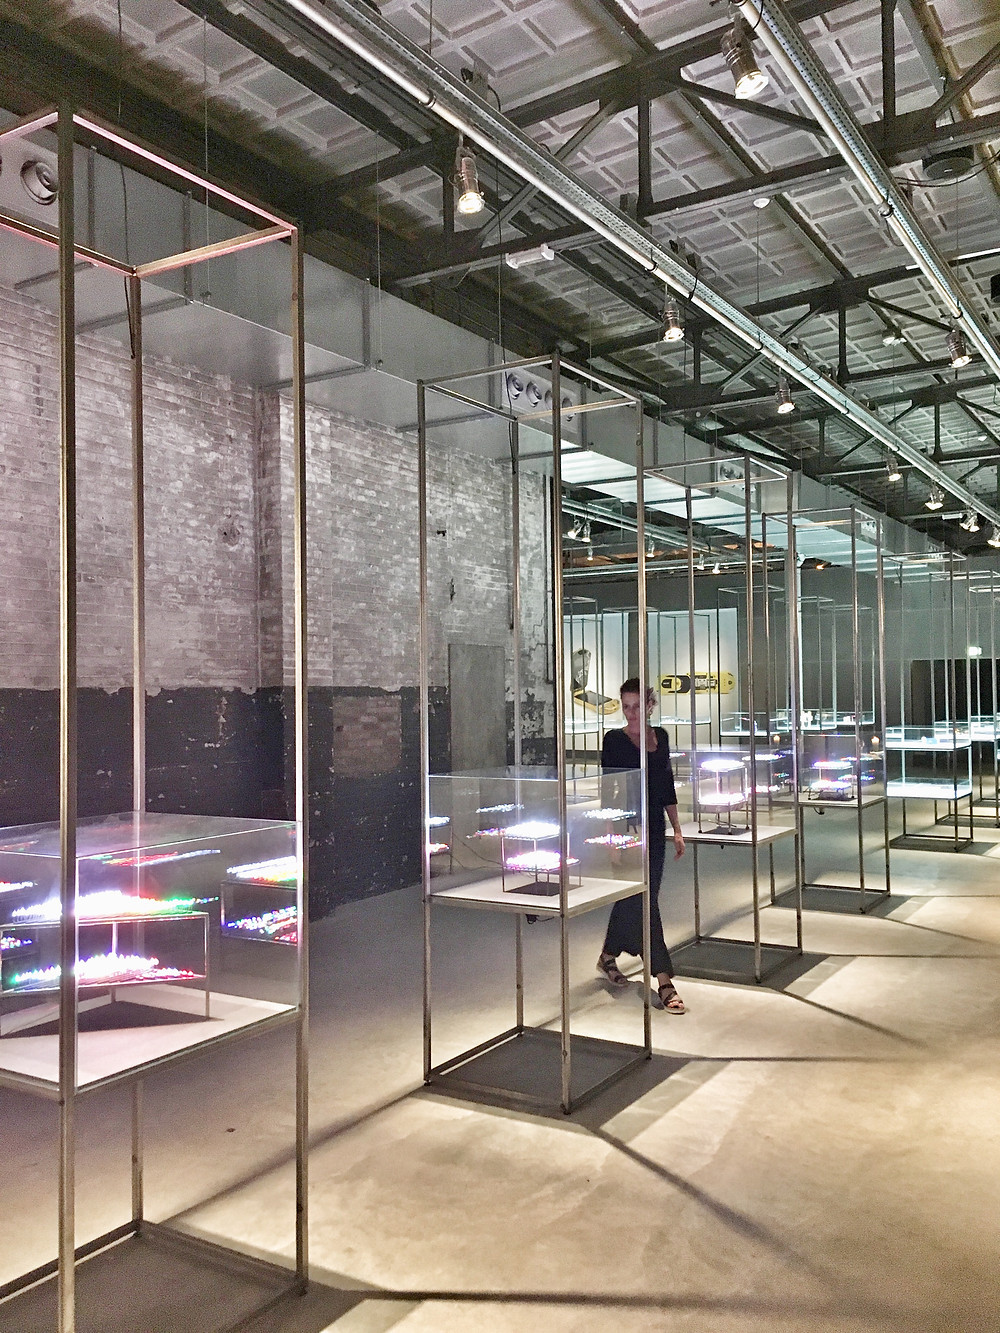 Exhibition 'Born at Night' at Kazerne in Eindhoven